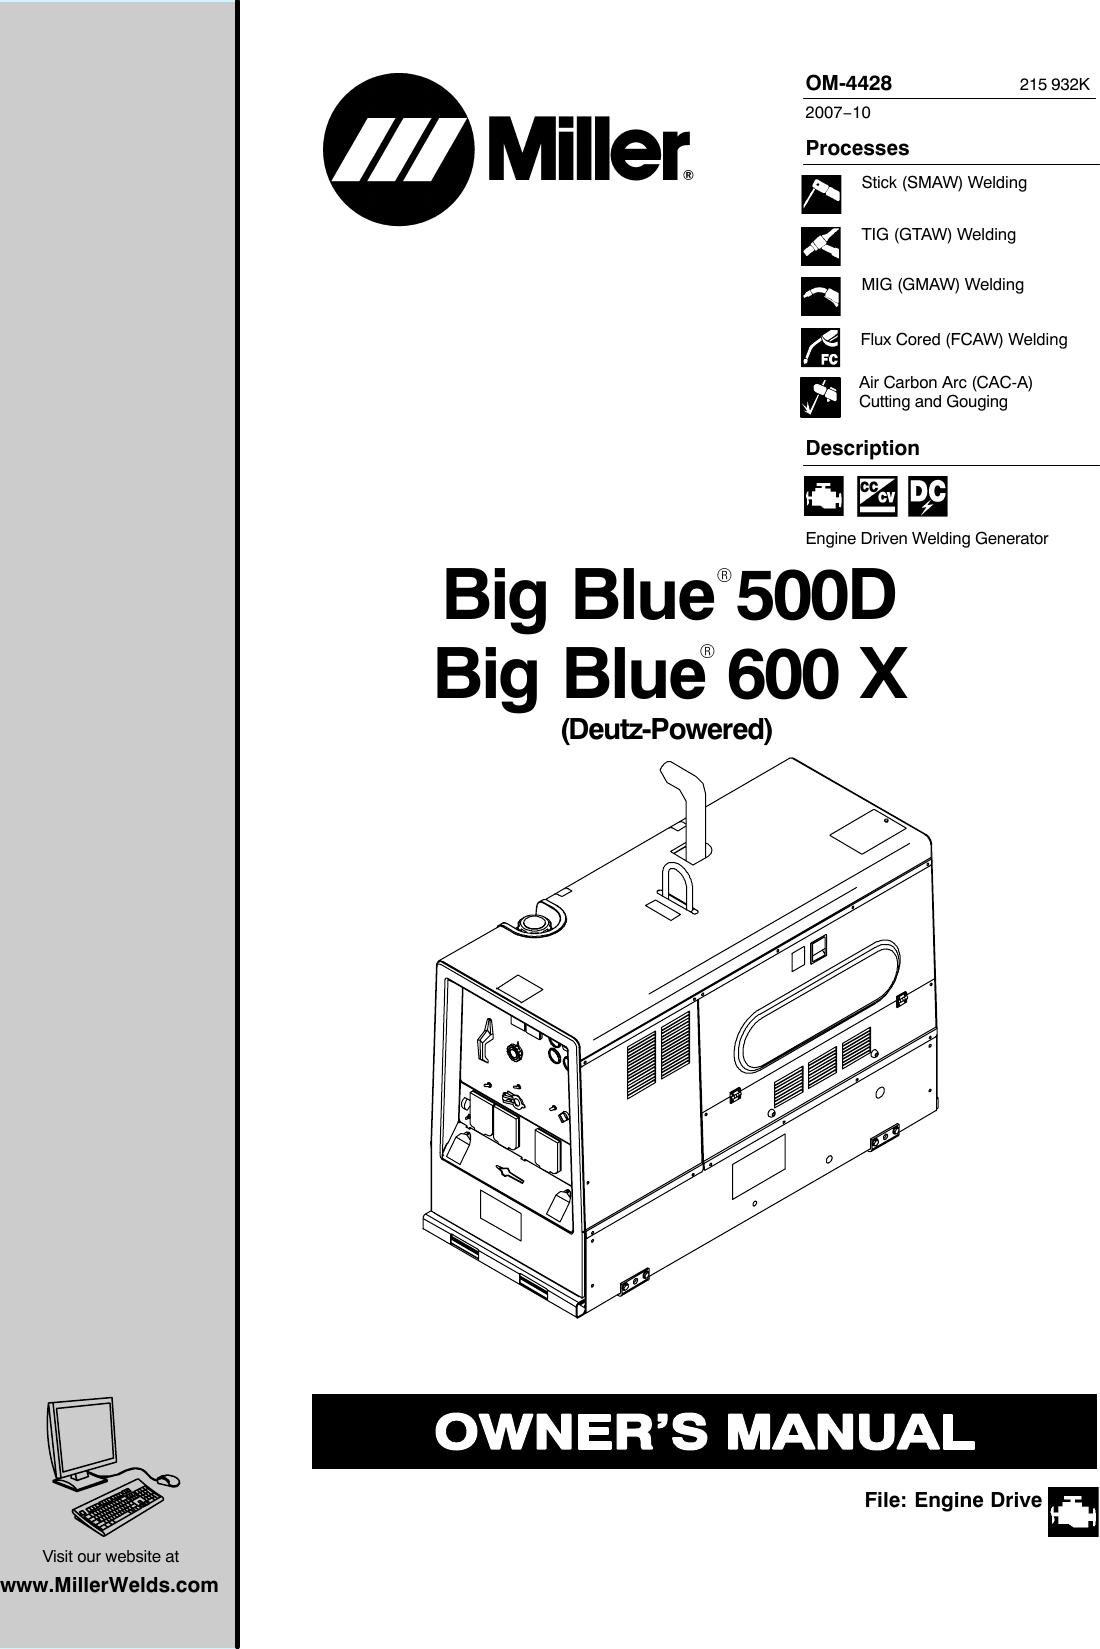 Miller Electric 500d Users Manual O4428k Mileco3934 Welding Generator Diagram